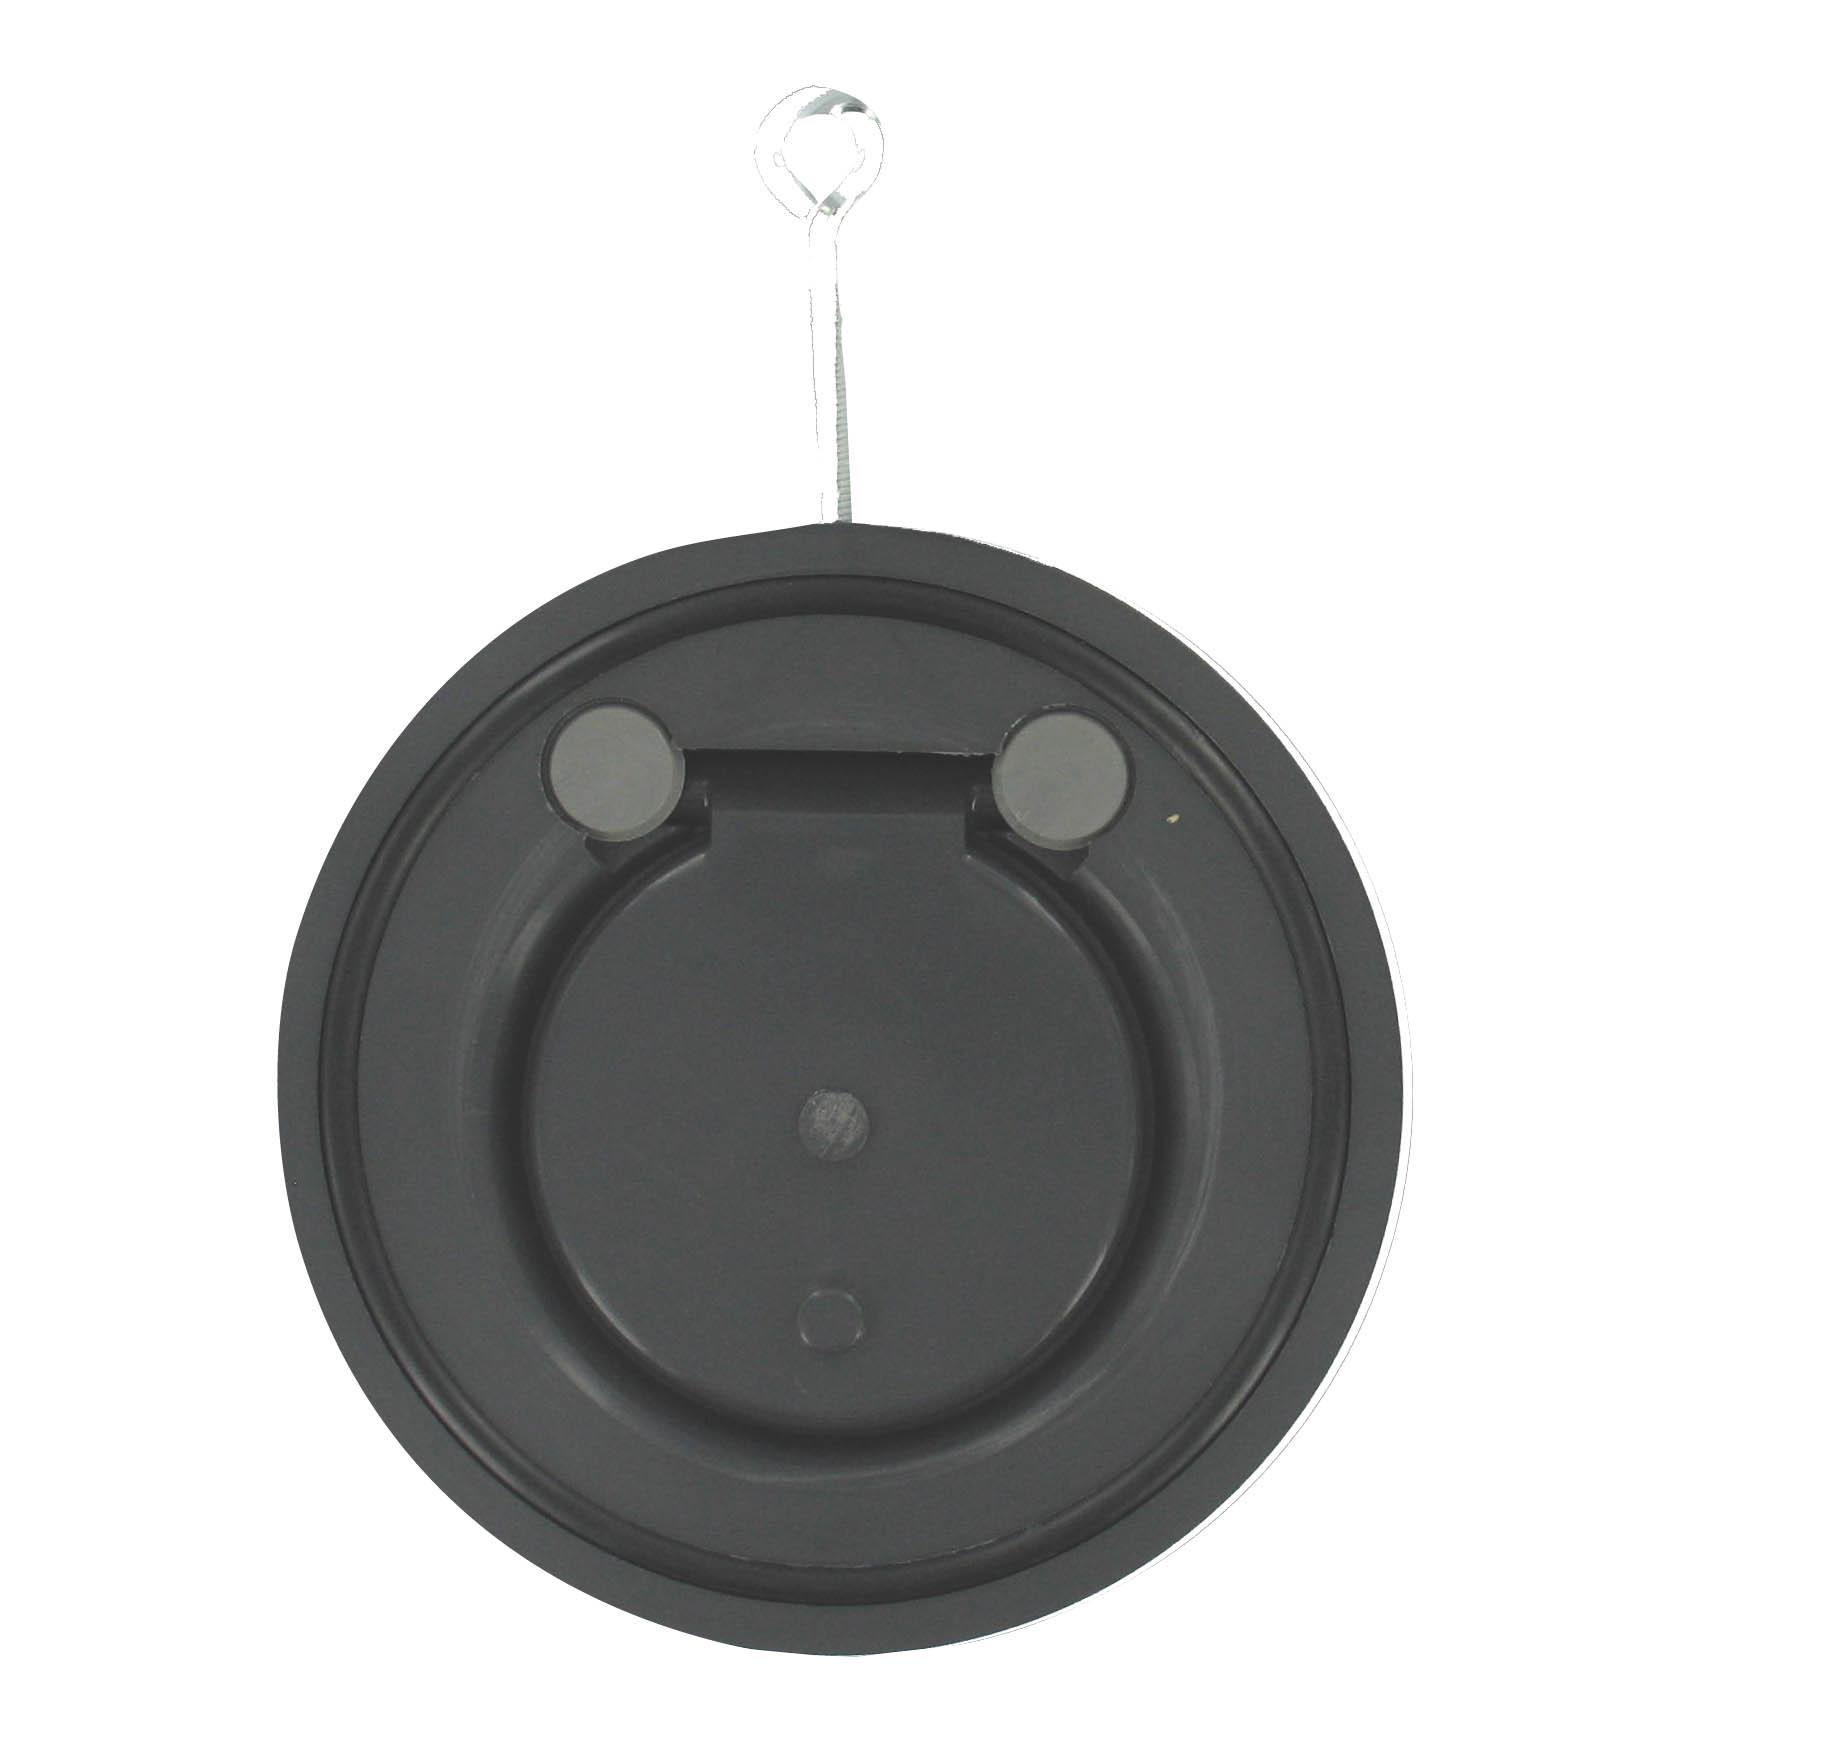 Plastic Flap Check Valve Dwyer Instruments Inc Zycon